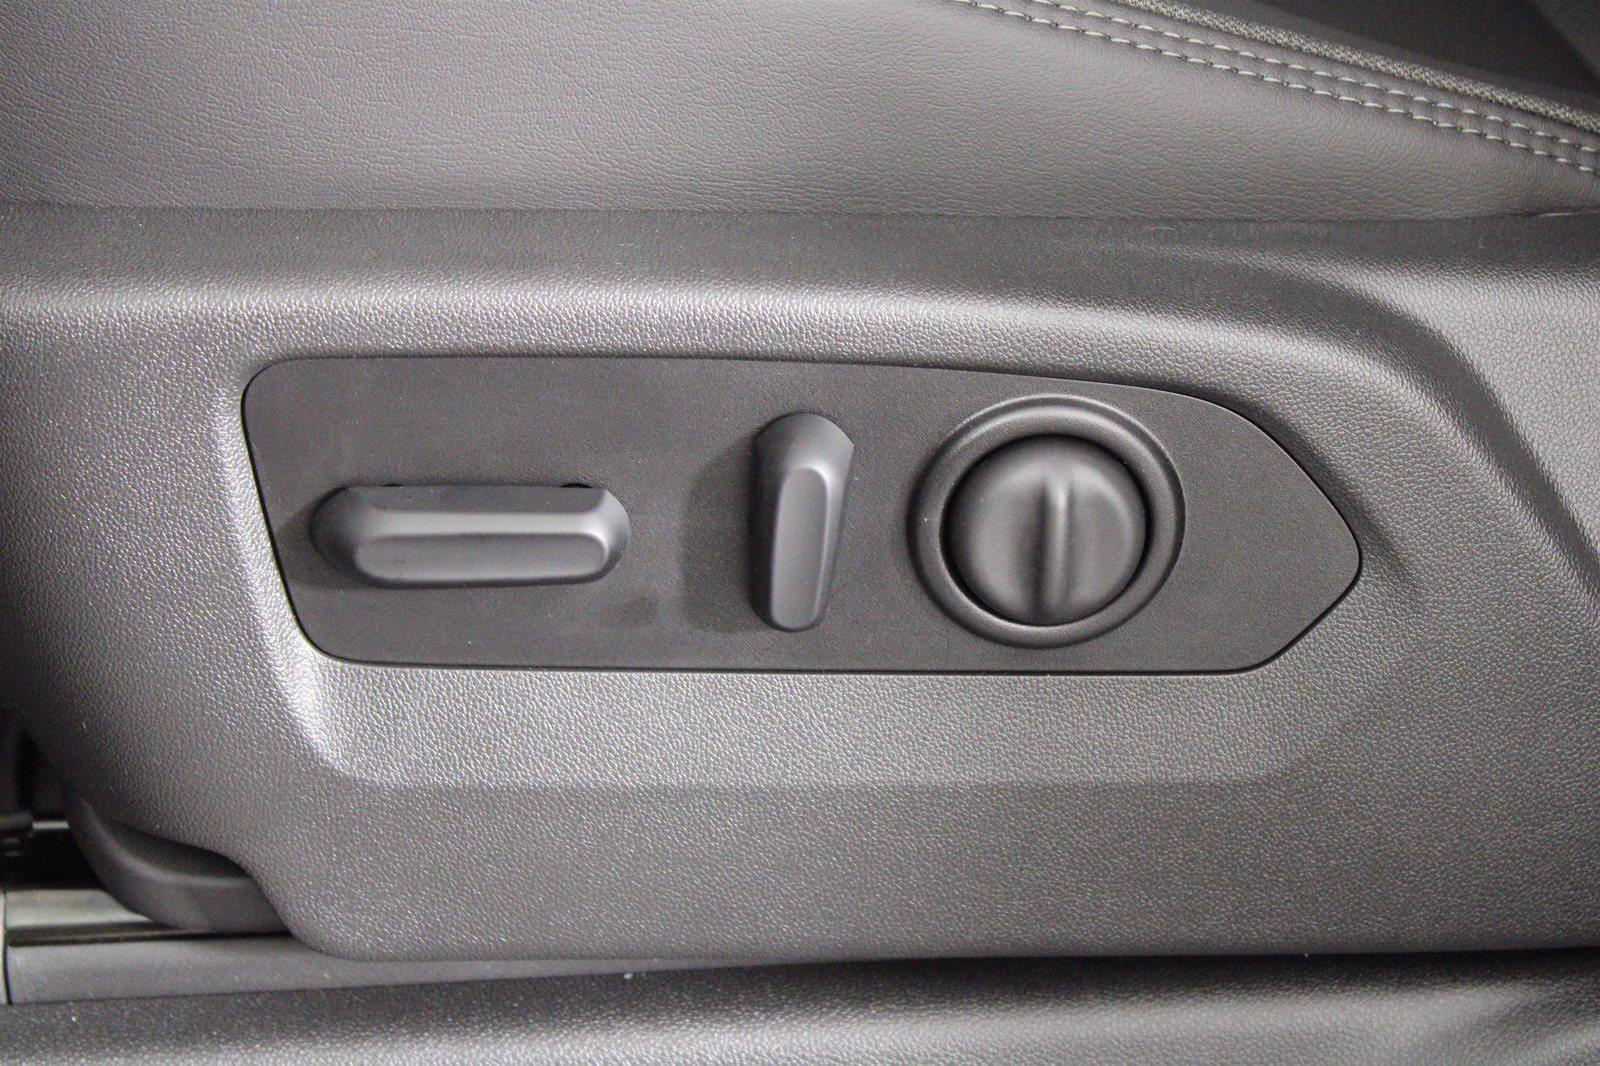 2021 Chevrolet Silverado 3500 Crew Cab 4x4, Pickup #D111087 - photo 14